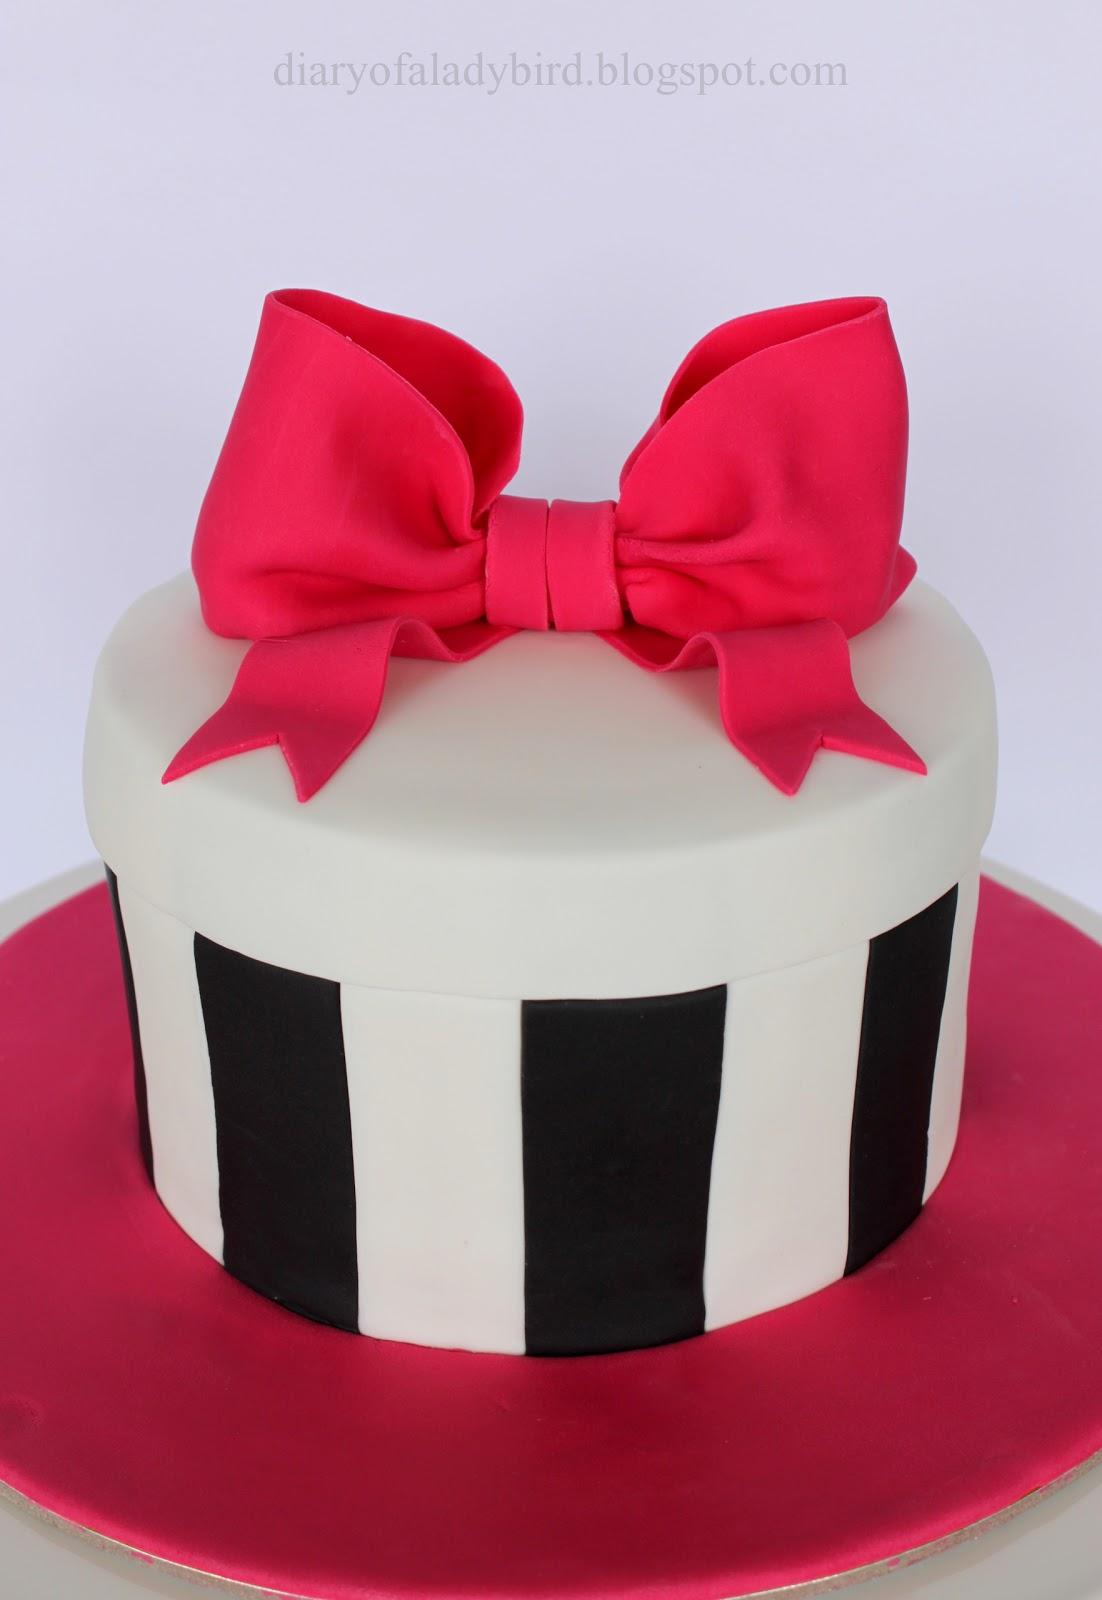 Diary Of A Ladybird Jacquis Birthday Cake